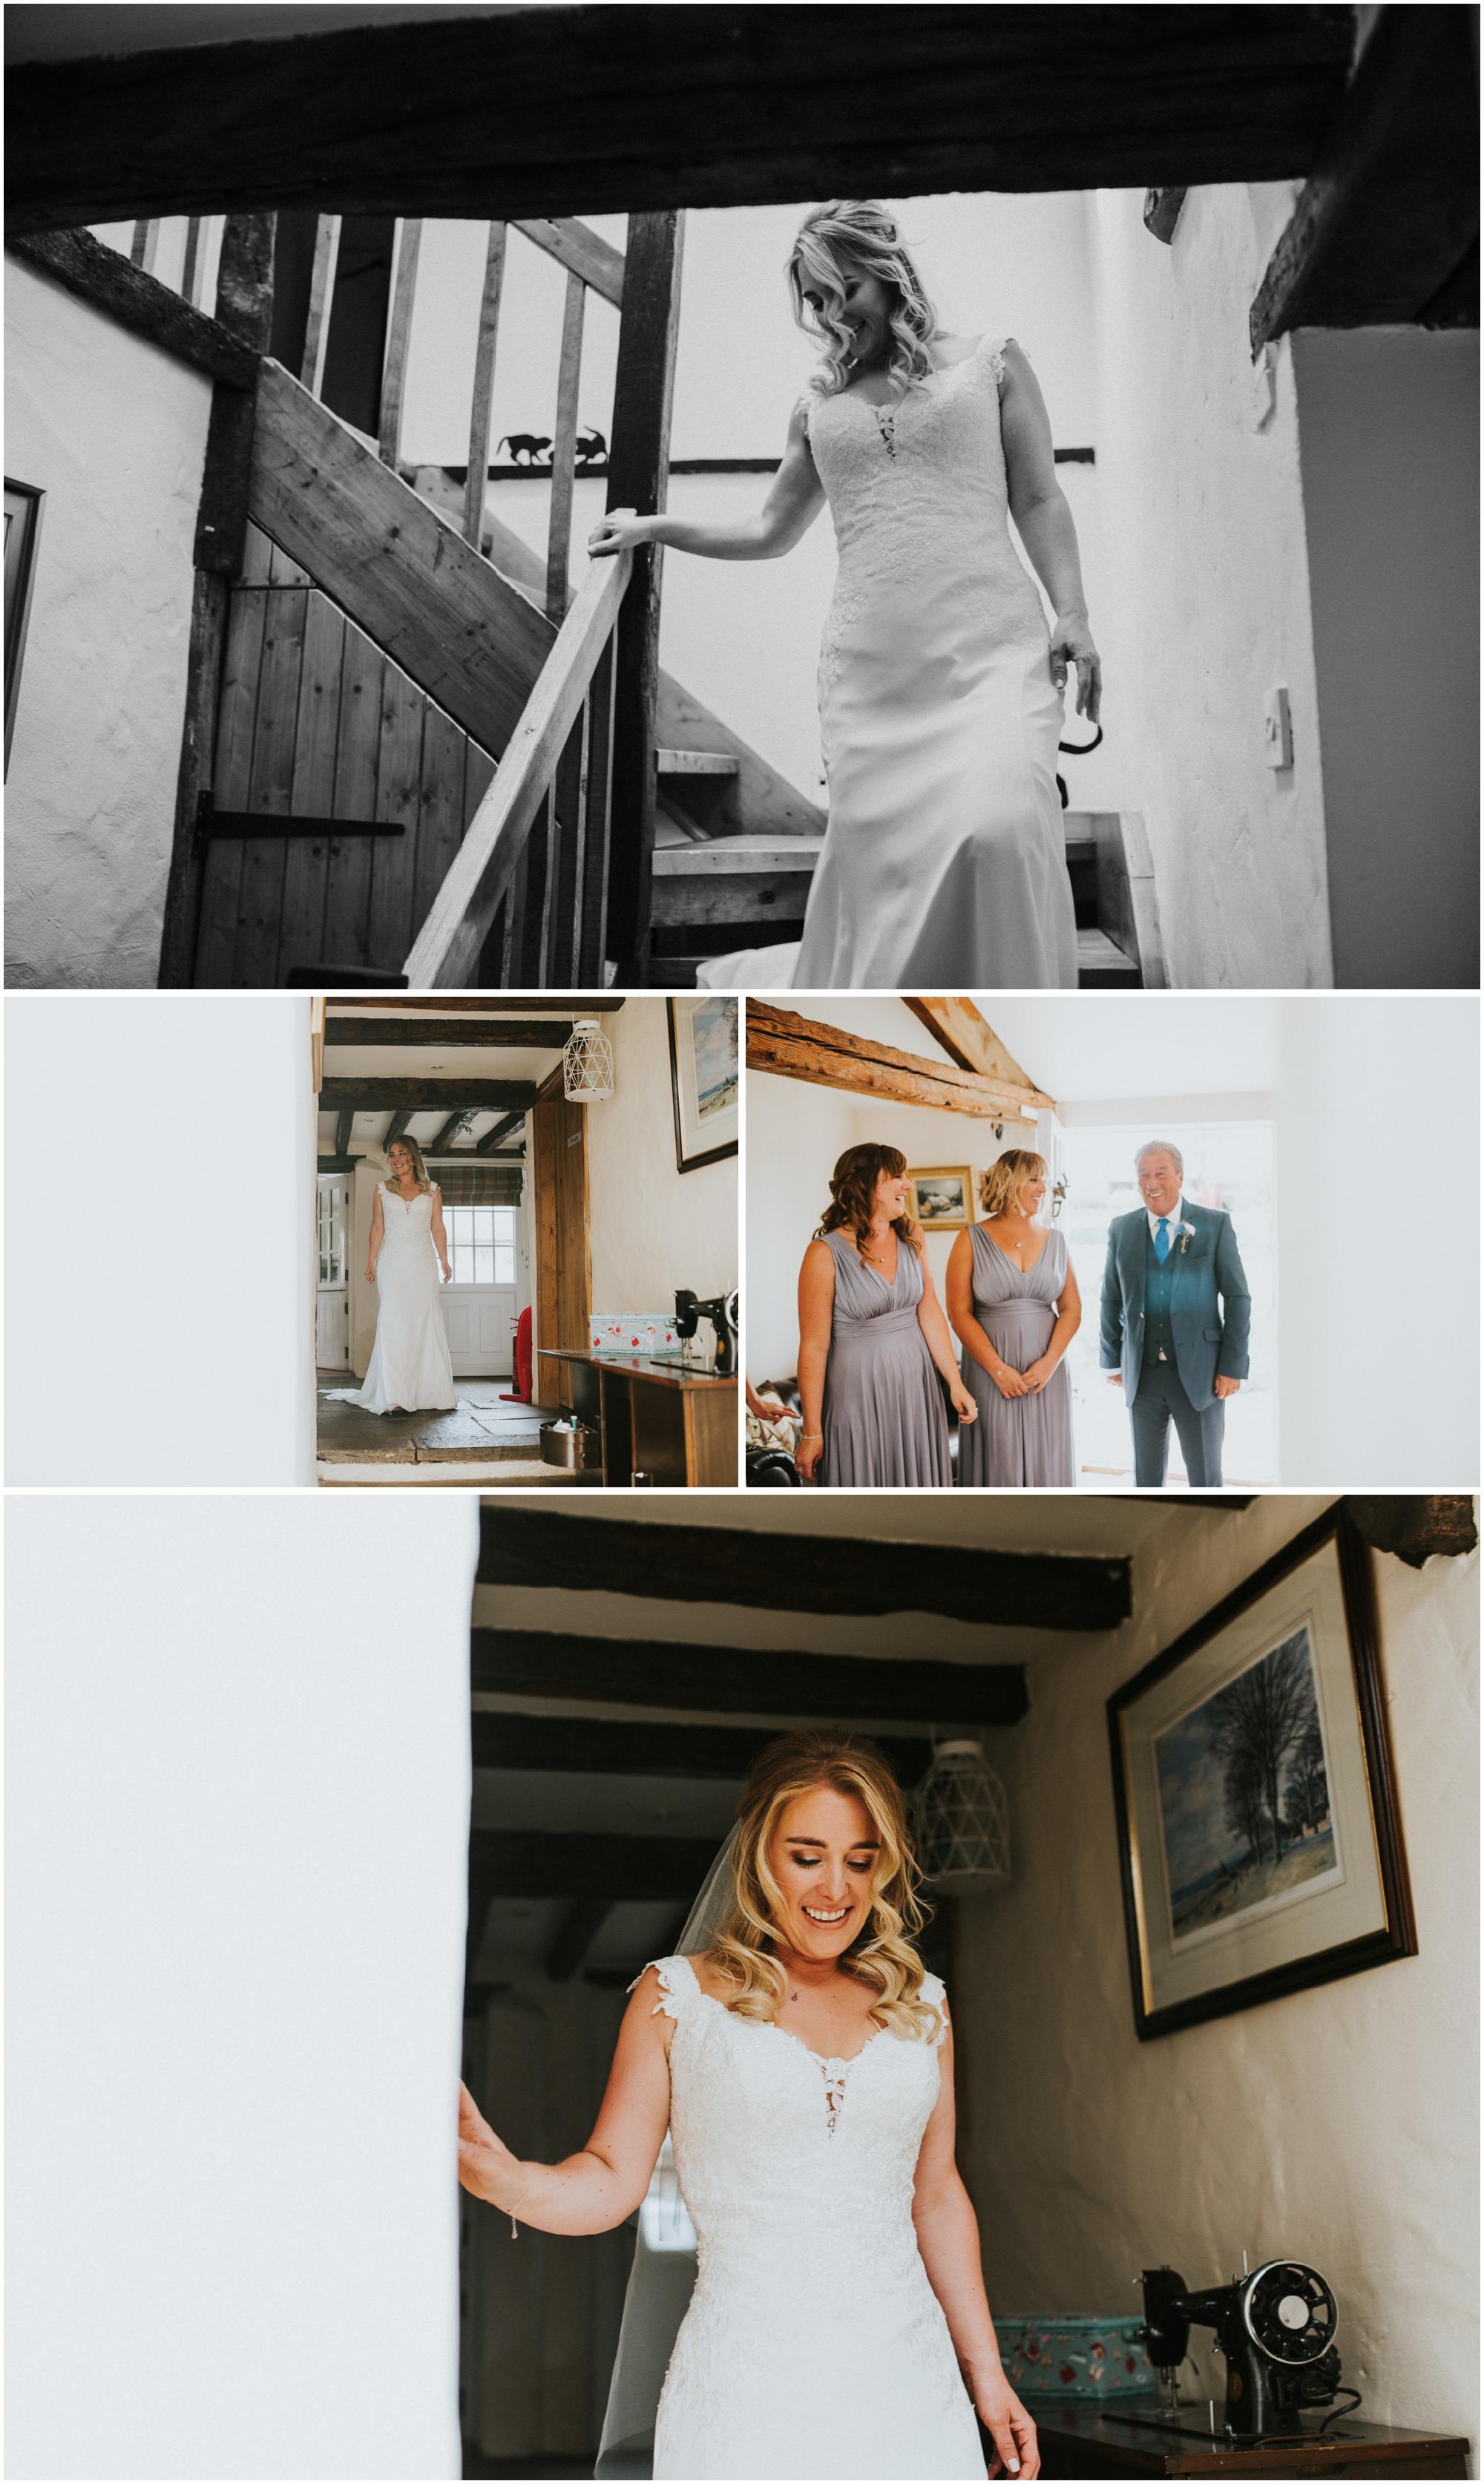 SkipbridegFarmWedding-LukeHolroyd-Yorkshirewedding_0021.jpg